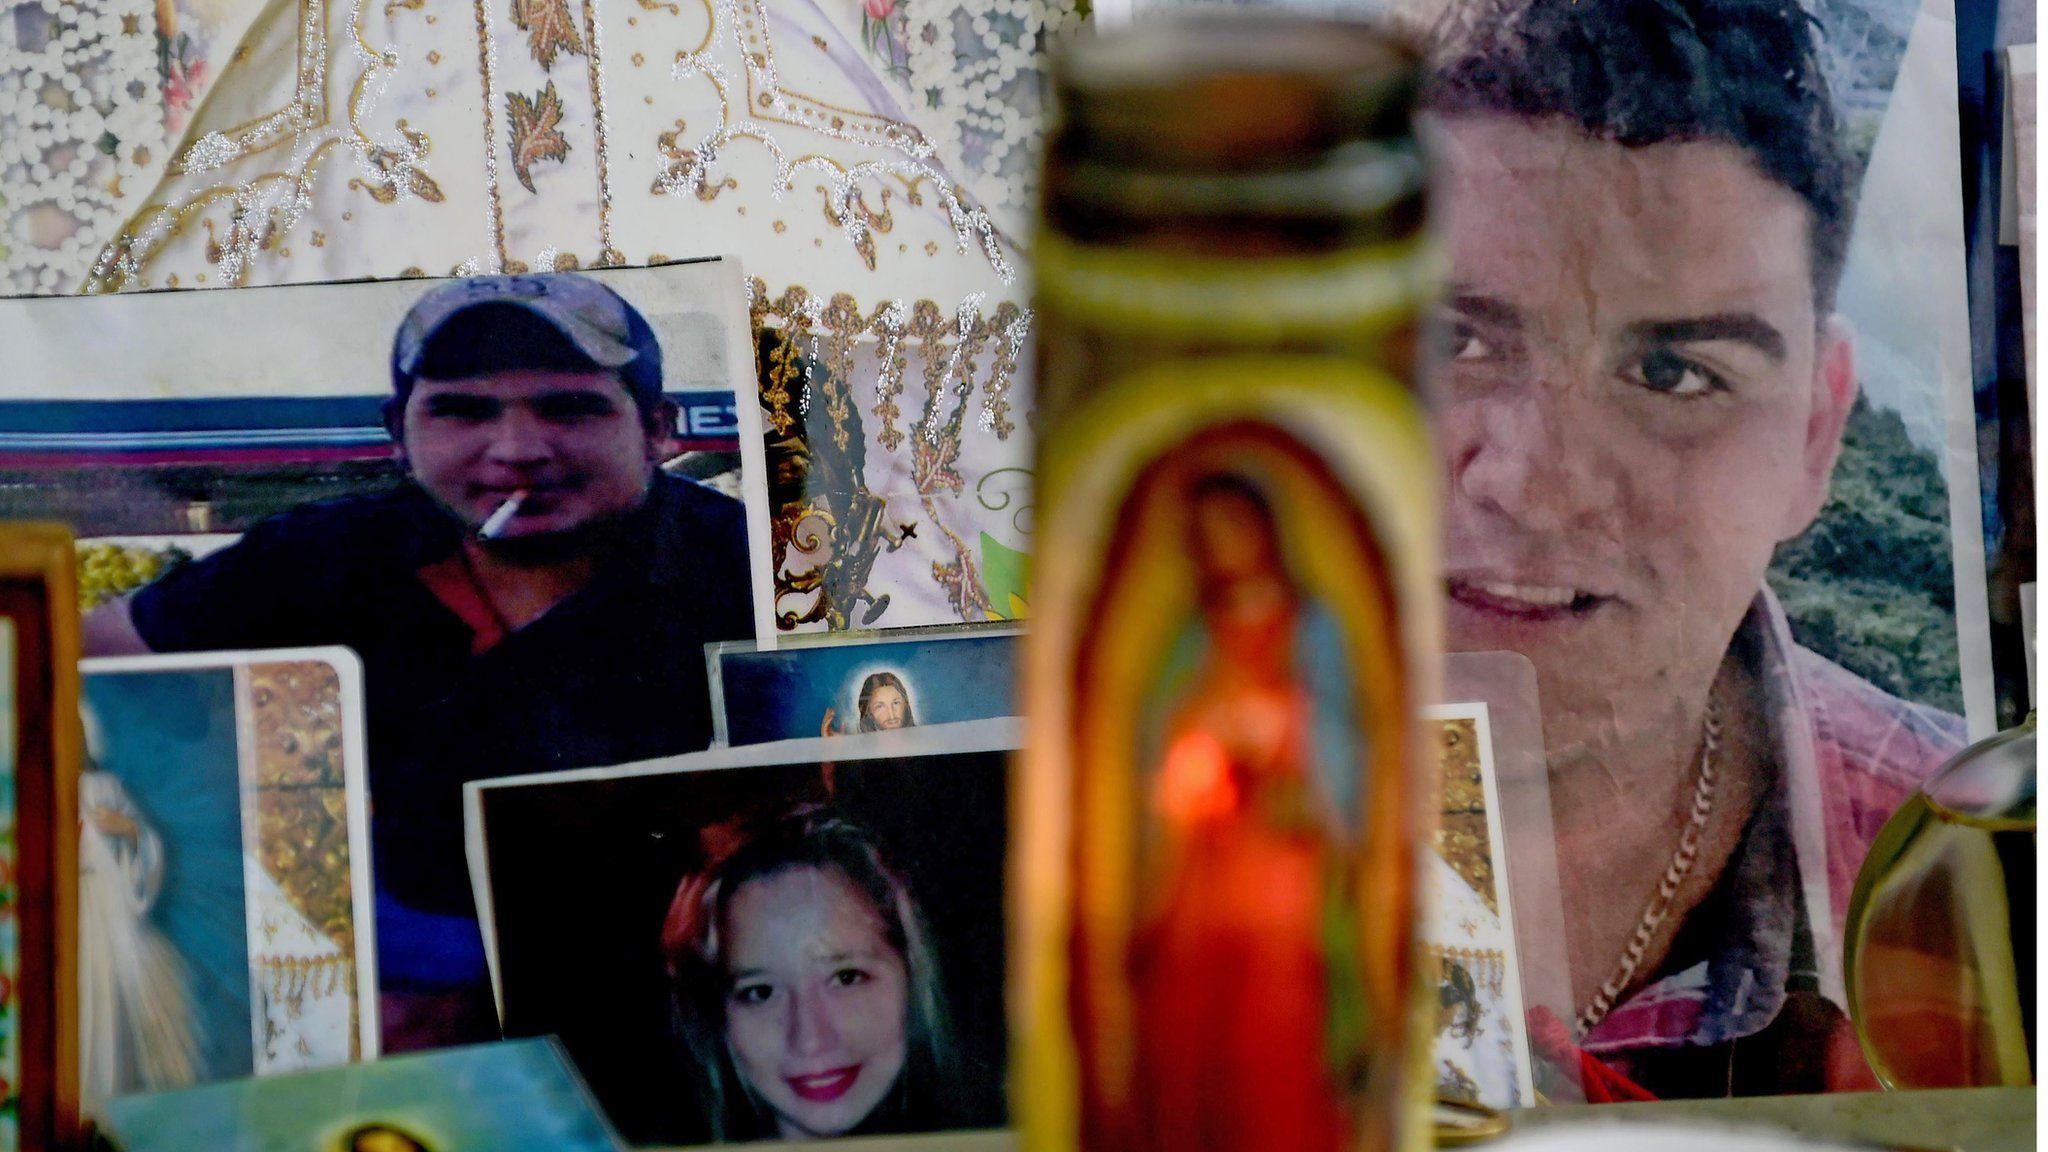 Mexico violence: Ten killed in Michoacán gang shootout - BBC News